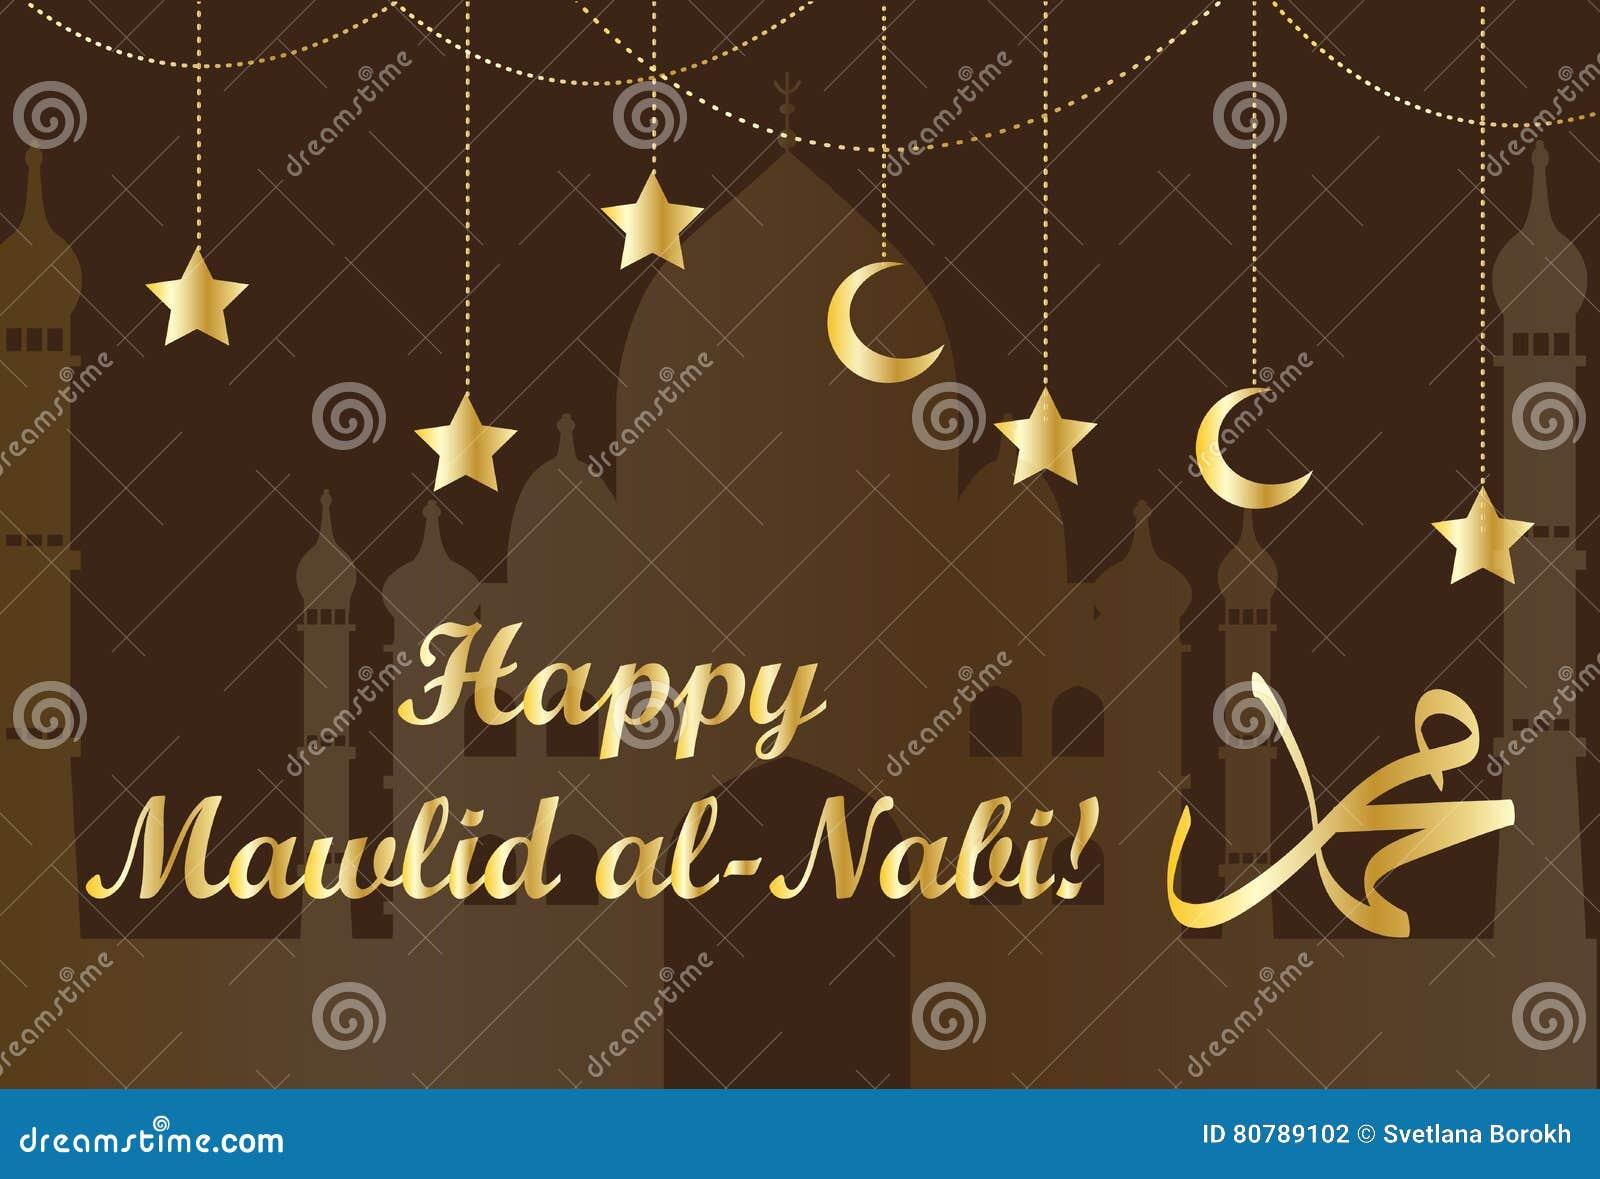 Mawlid al nabi the birthday of the prophet muhammad greeting card download mawlid al nabi the birthday of the prophet muhammad greeting card muslim celebration m4hsunfo